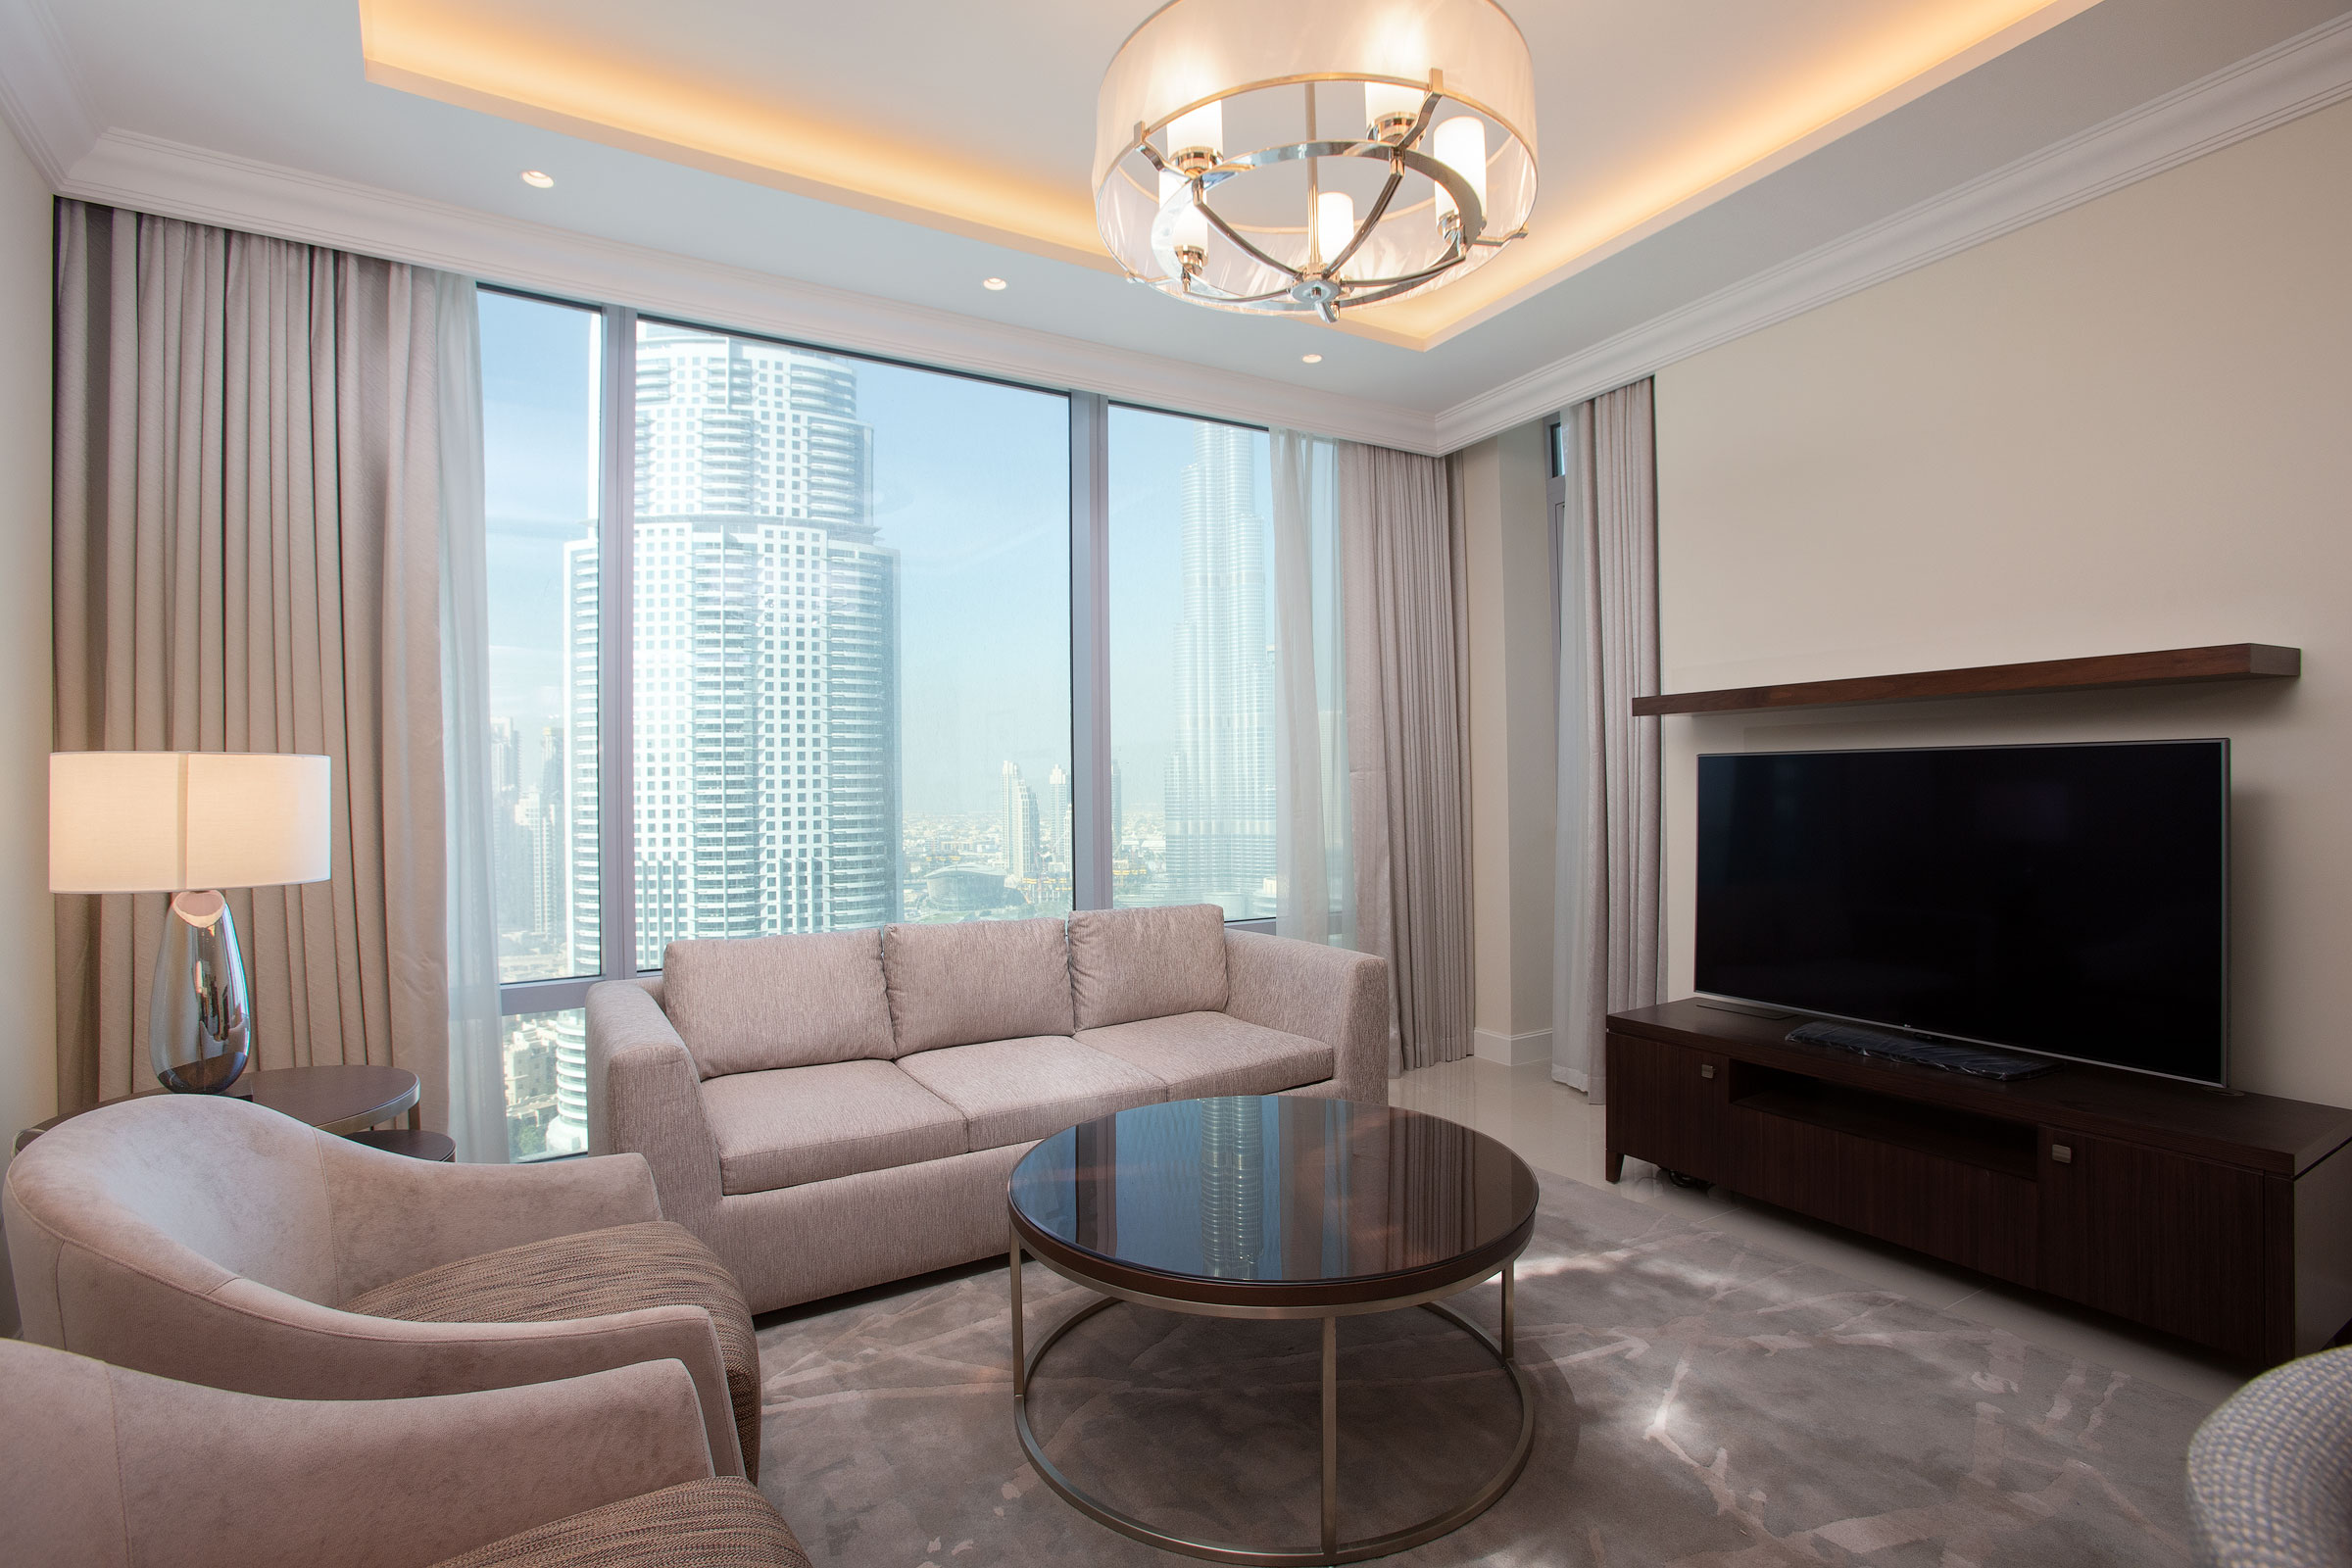 Full Burj Khalifa & Fountain Center Unit